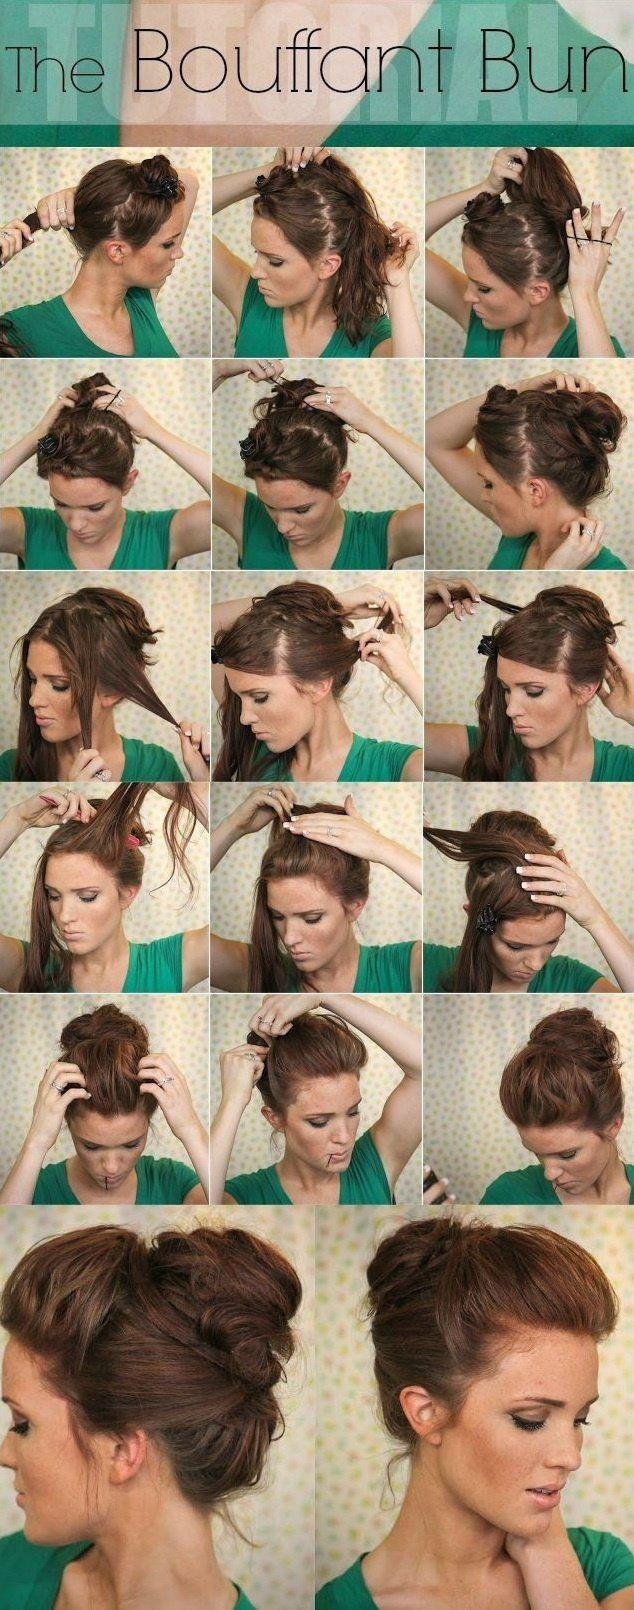 The Bouffant Bun - Hairstyle Tutorial